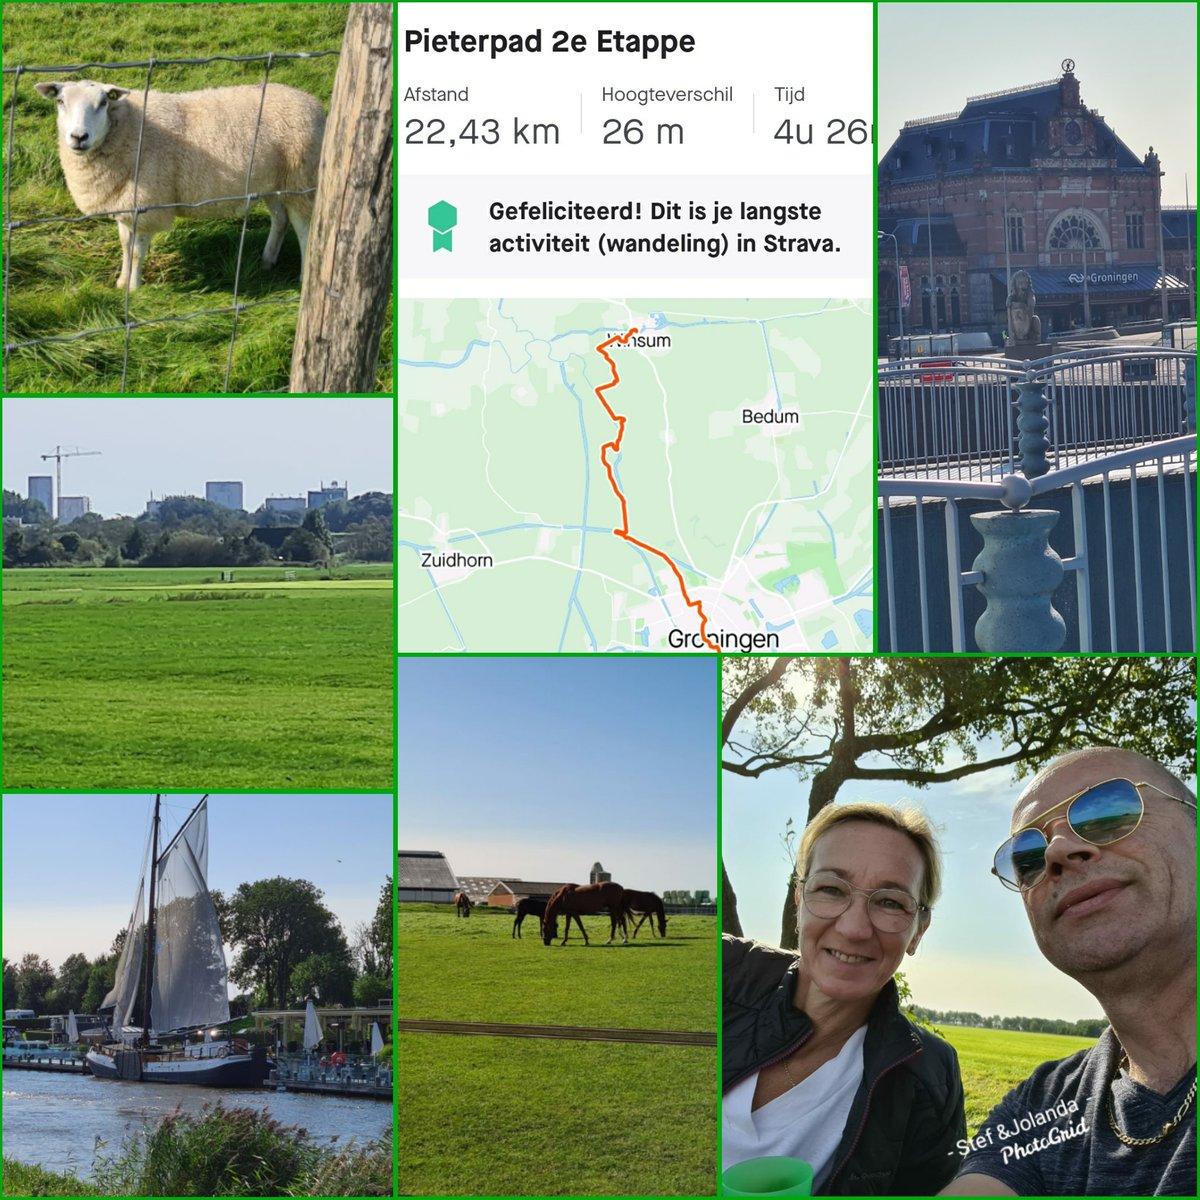 Gisteren 2e Etappe #Pieterpad gelopen! 22,43 km #trots #winsum #groningen #wandelen #nature #hikingadventures #hiking https://t.co/041zvyukNv